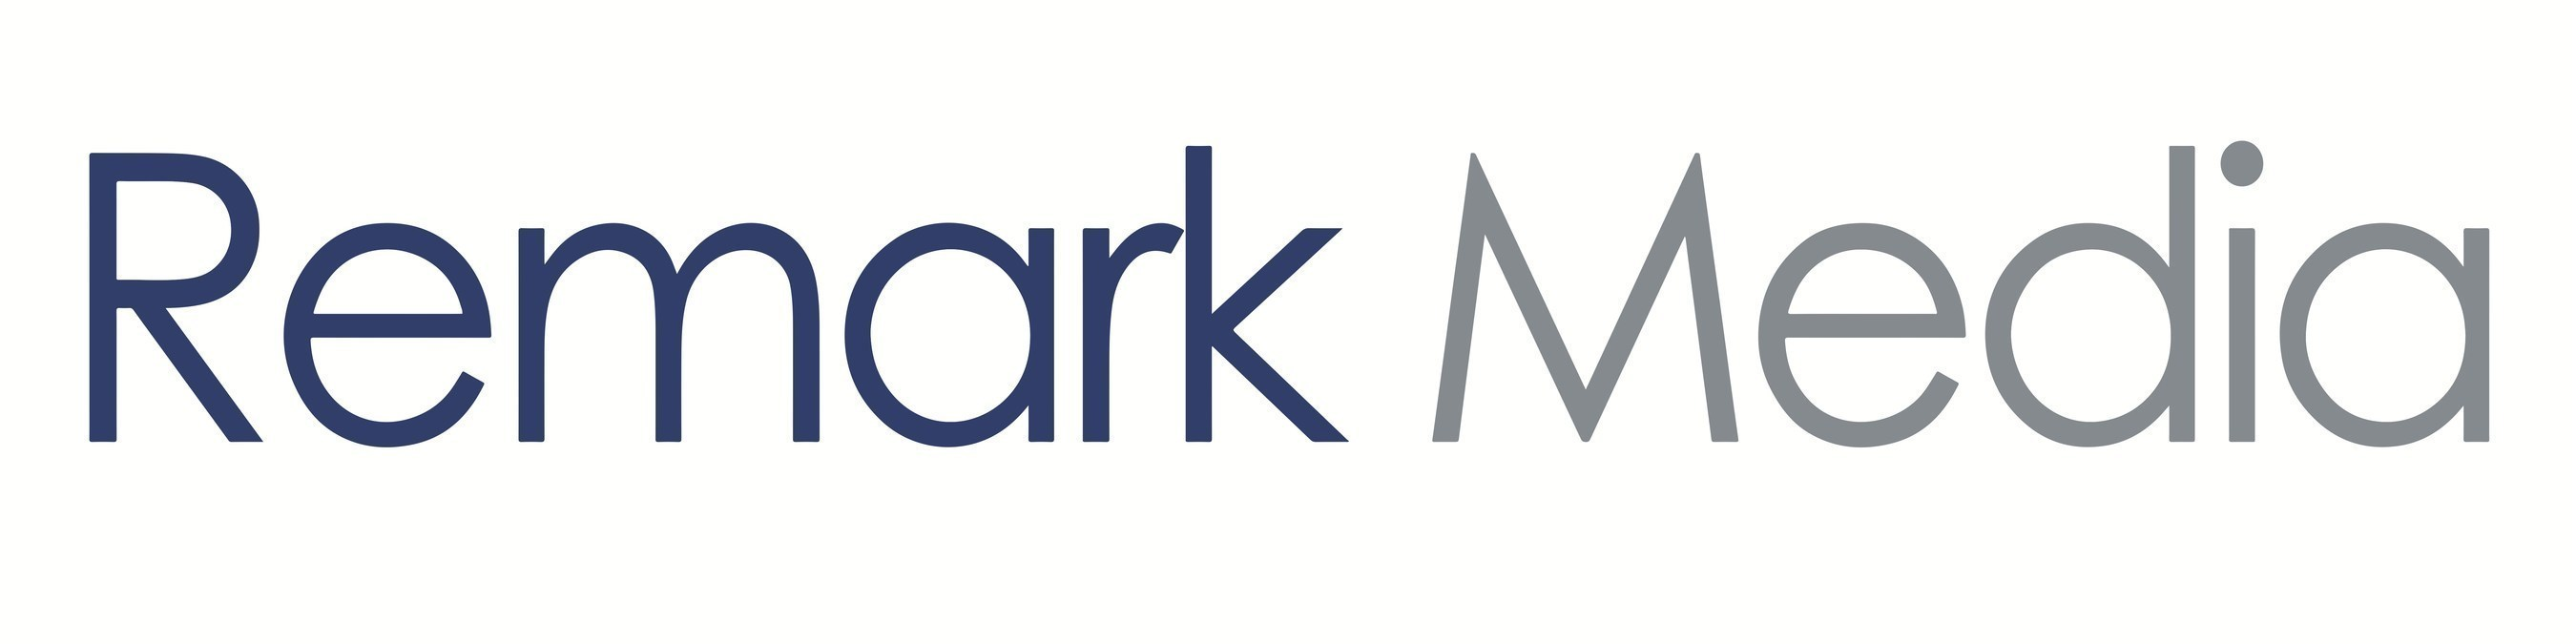 Remark Media, Inc.